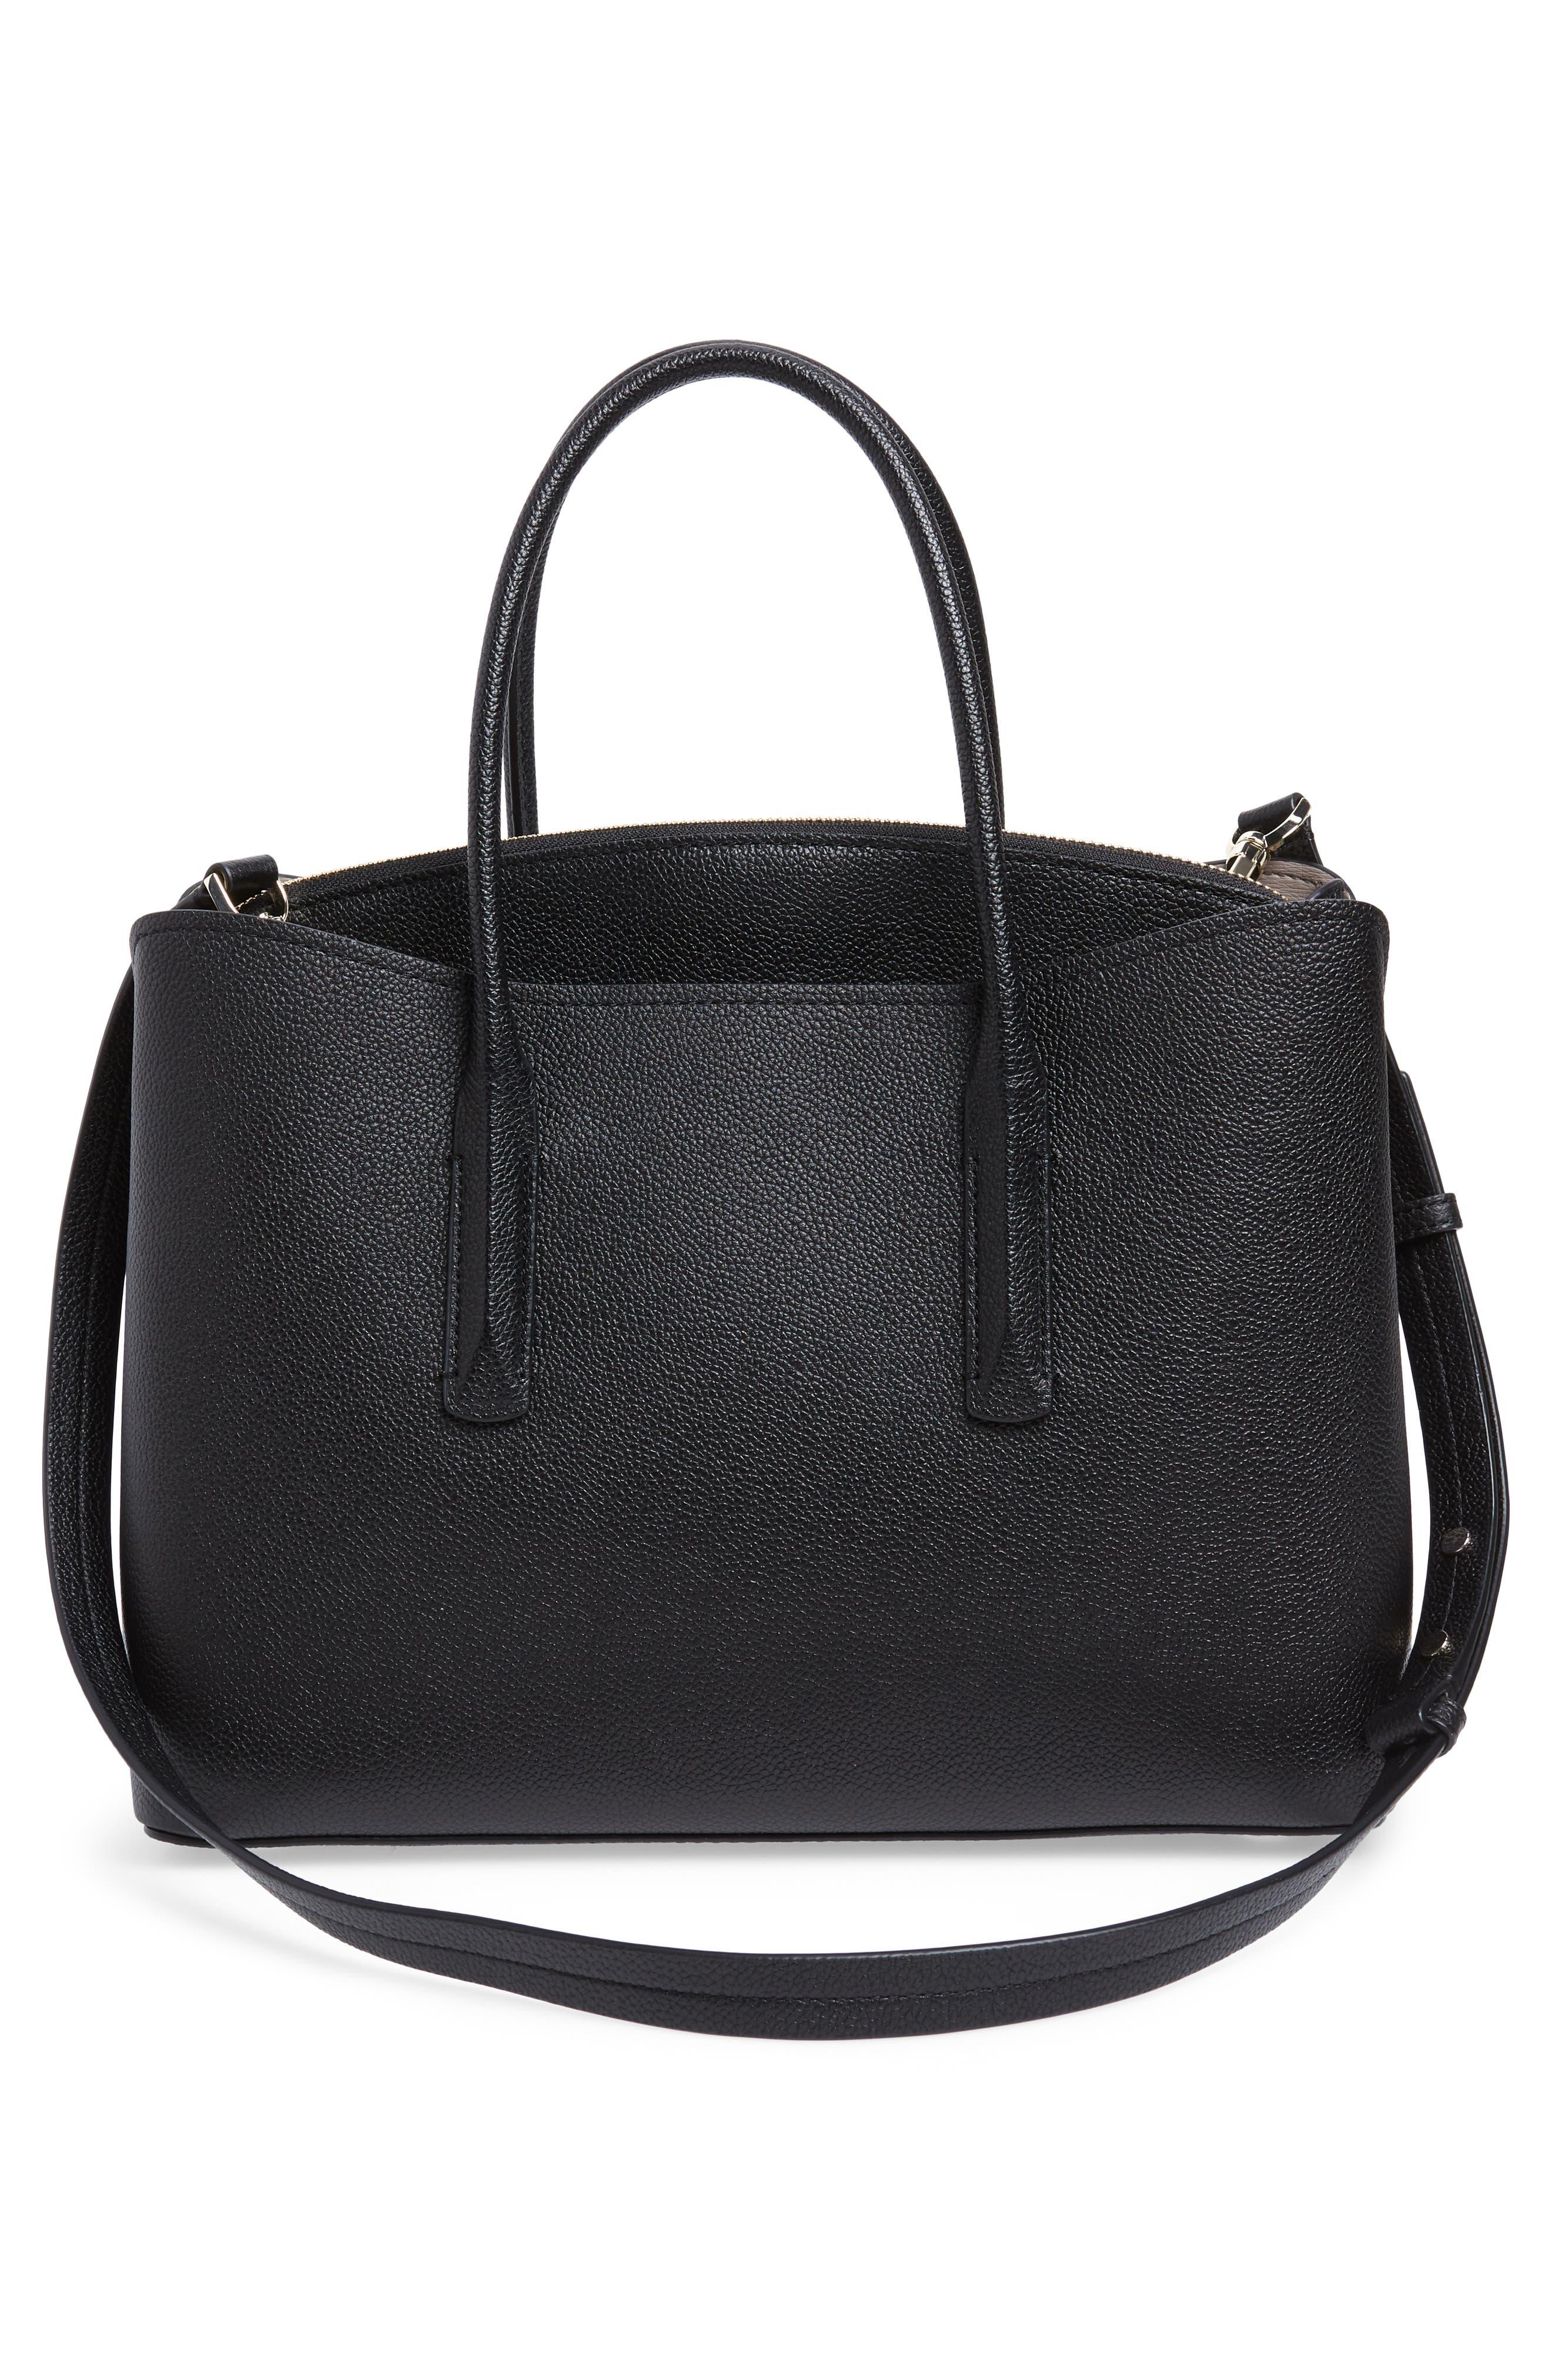 ec9e38c23e Kate Spade New York Tote Bags for Women  Leather